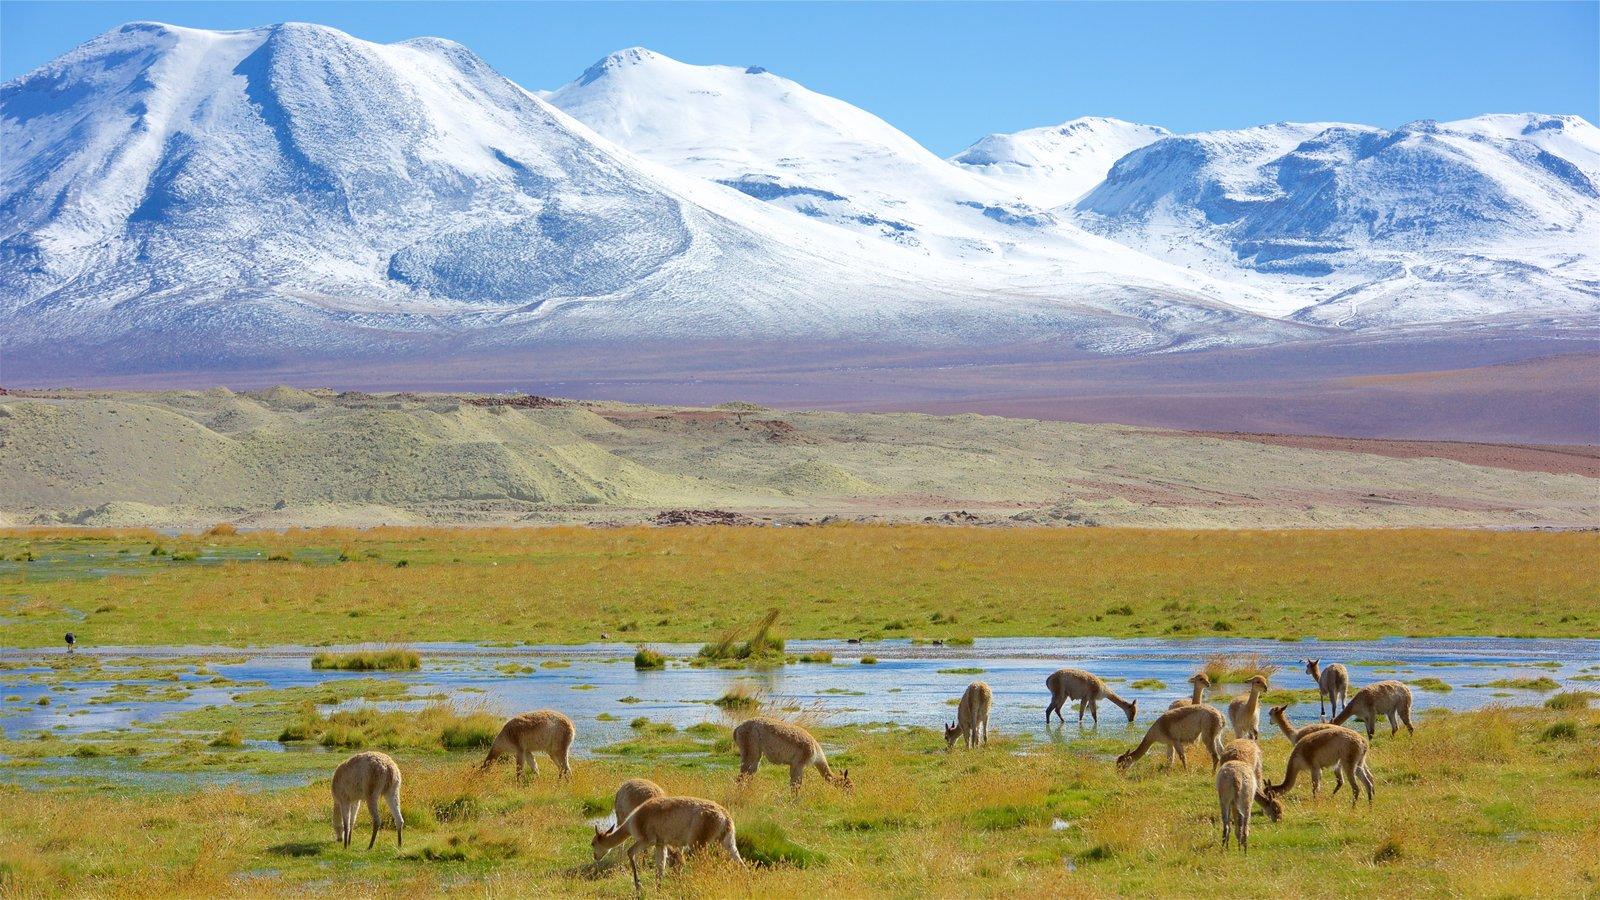 Chile caracterizando cenas tranquilas, animais terrestres e montanhas